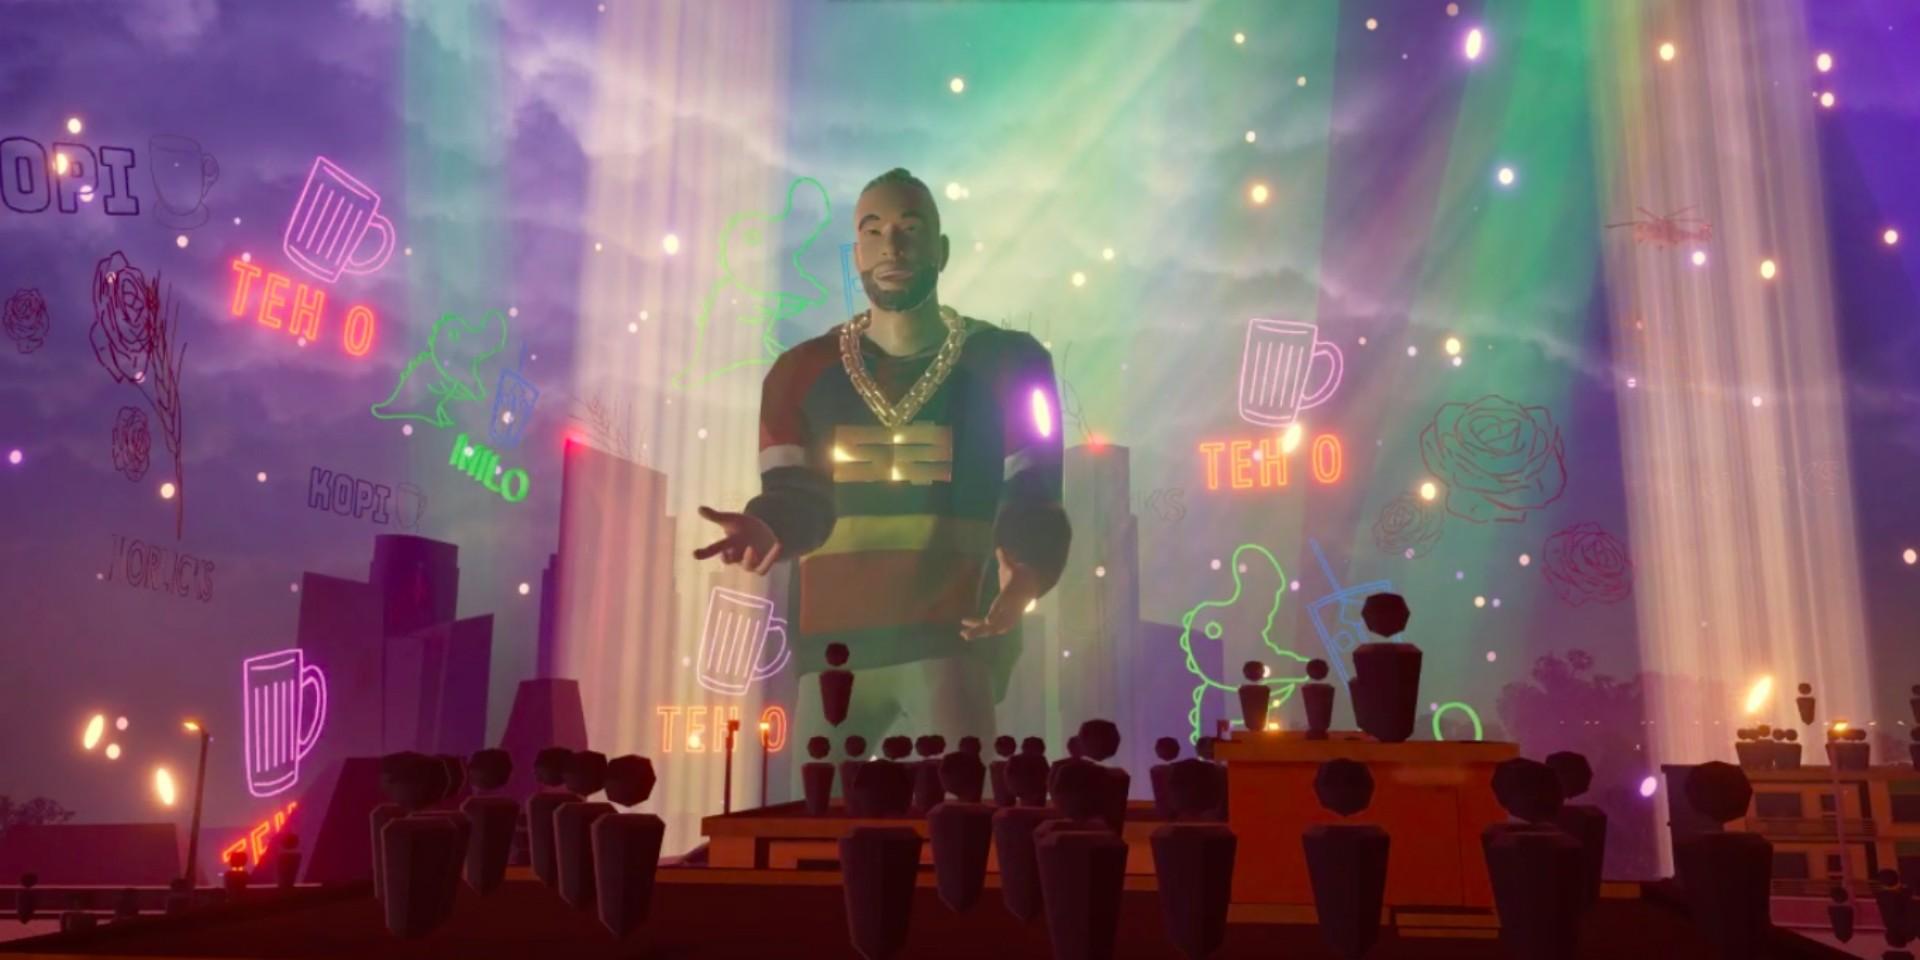 ShiGGa Shay and MRGE take us behind the scenes of virtual show, '365' Mixed Reality Experience